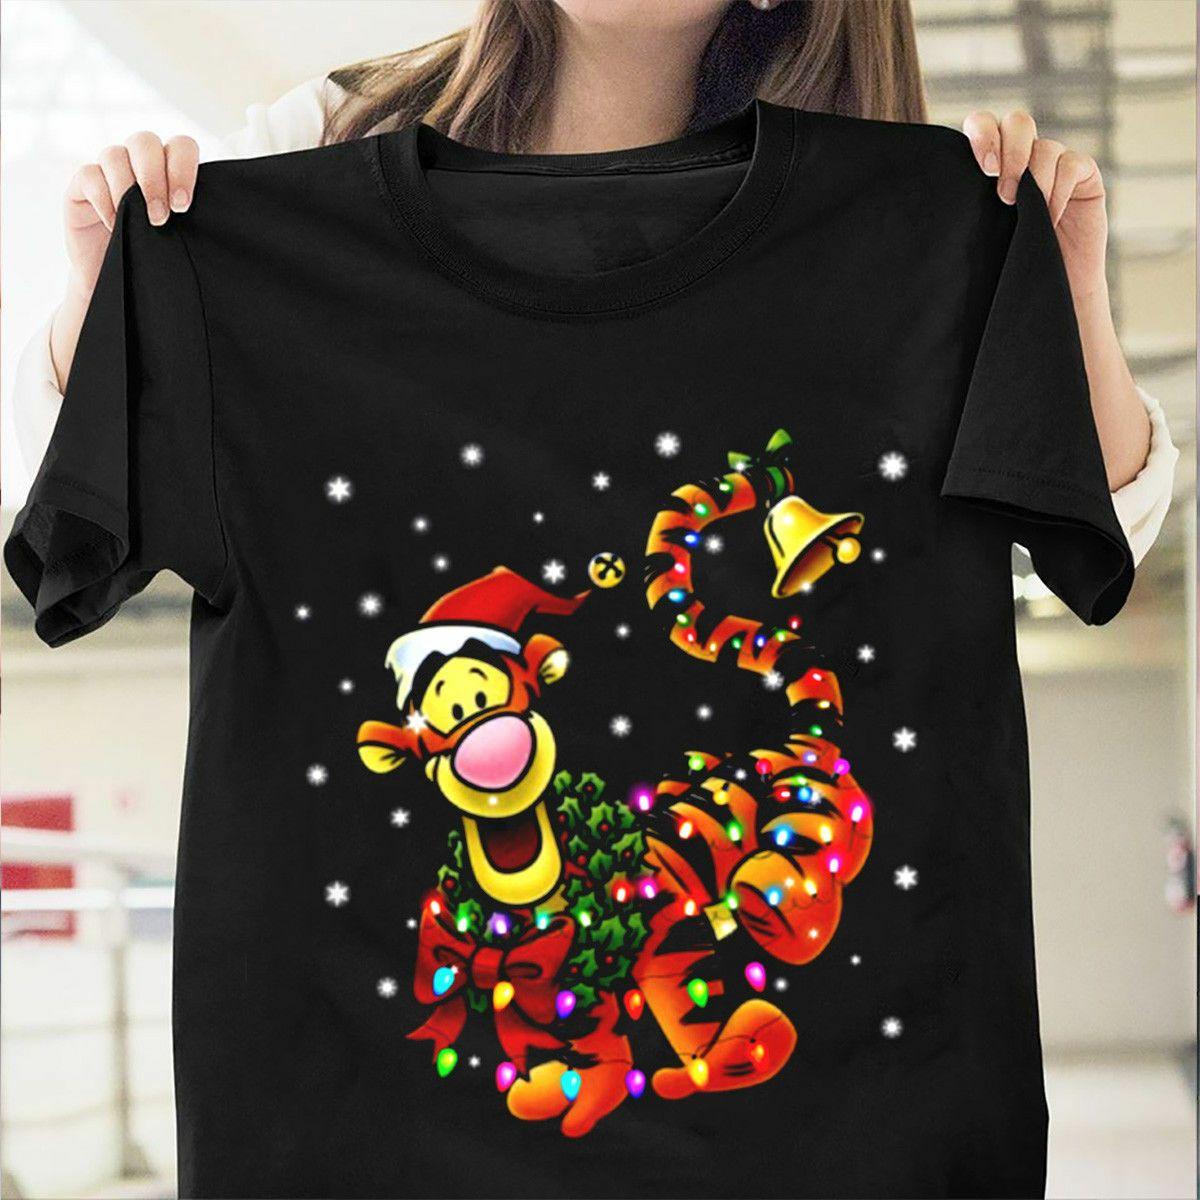 Santa Tigger Winnie The Pooh Christmas Light T Shirt Black Cotton Men S 6xl Hot